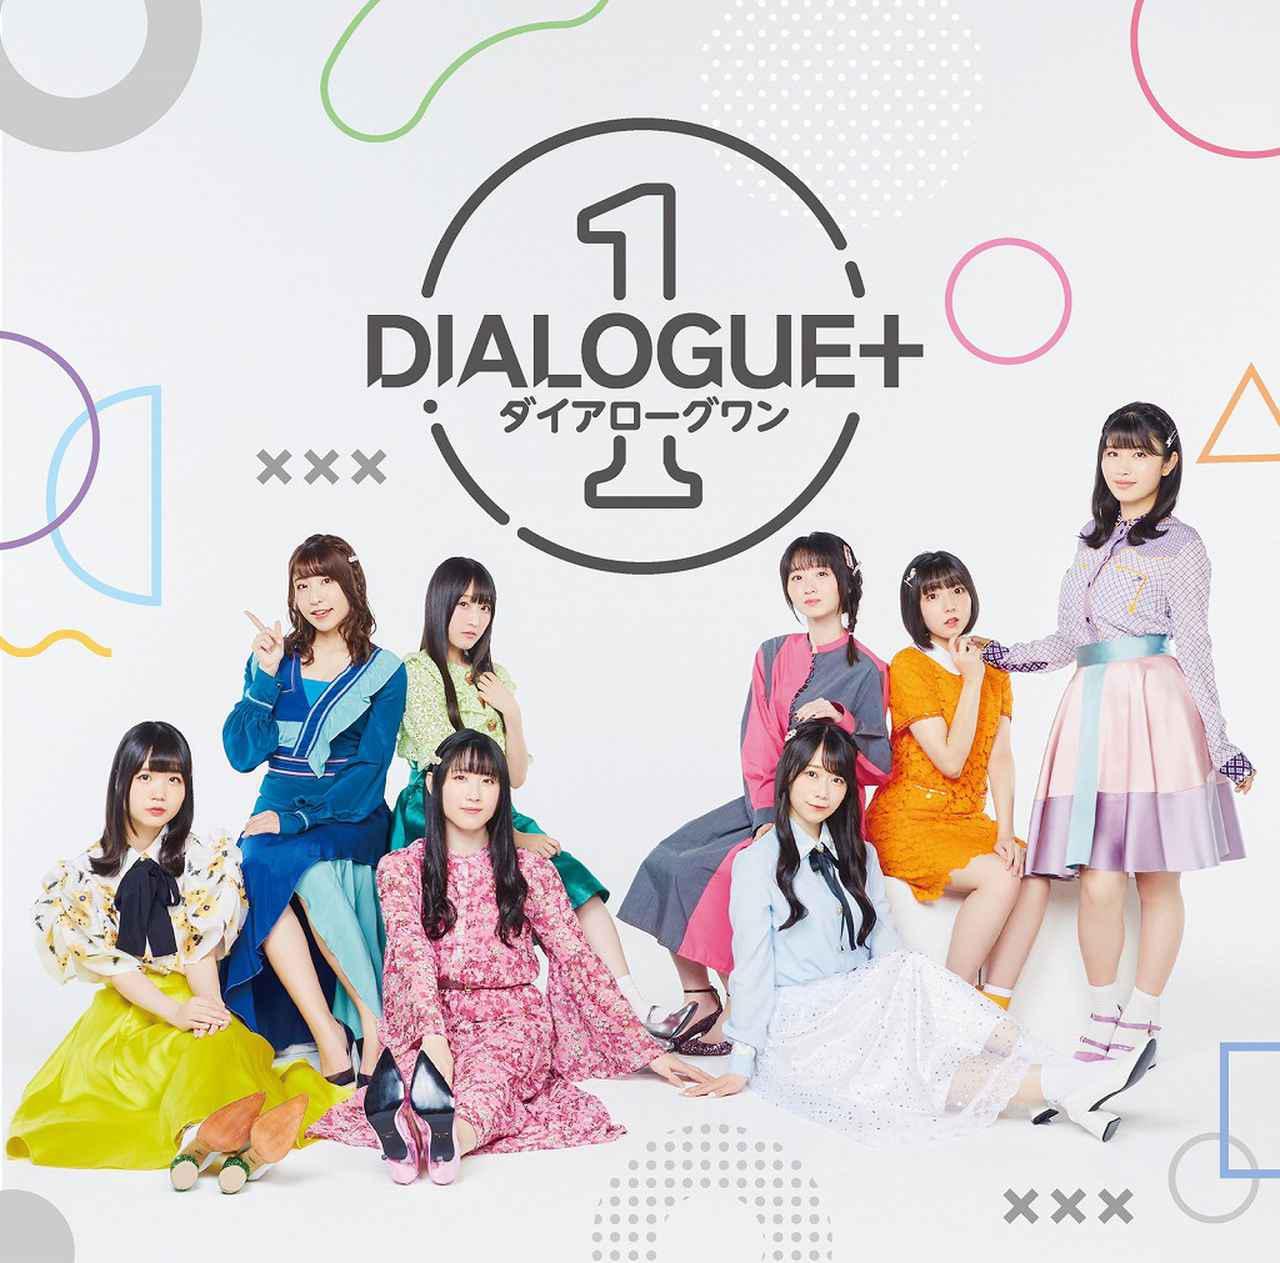 画像: DIALOGUE+1 / DIALOGUE+